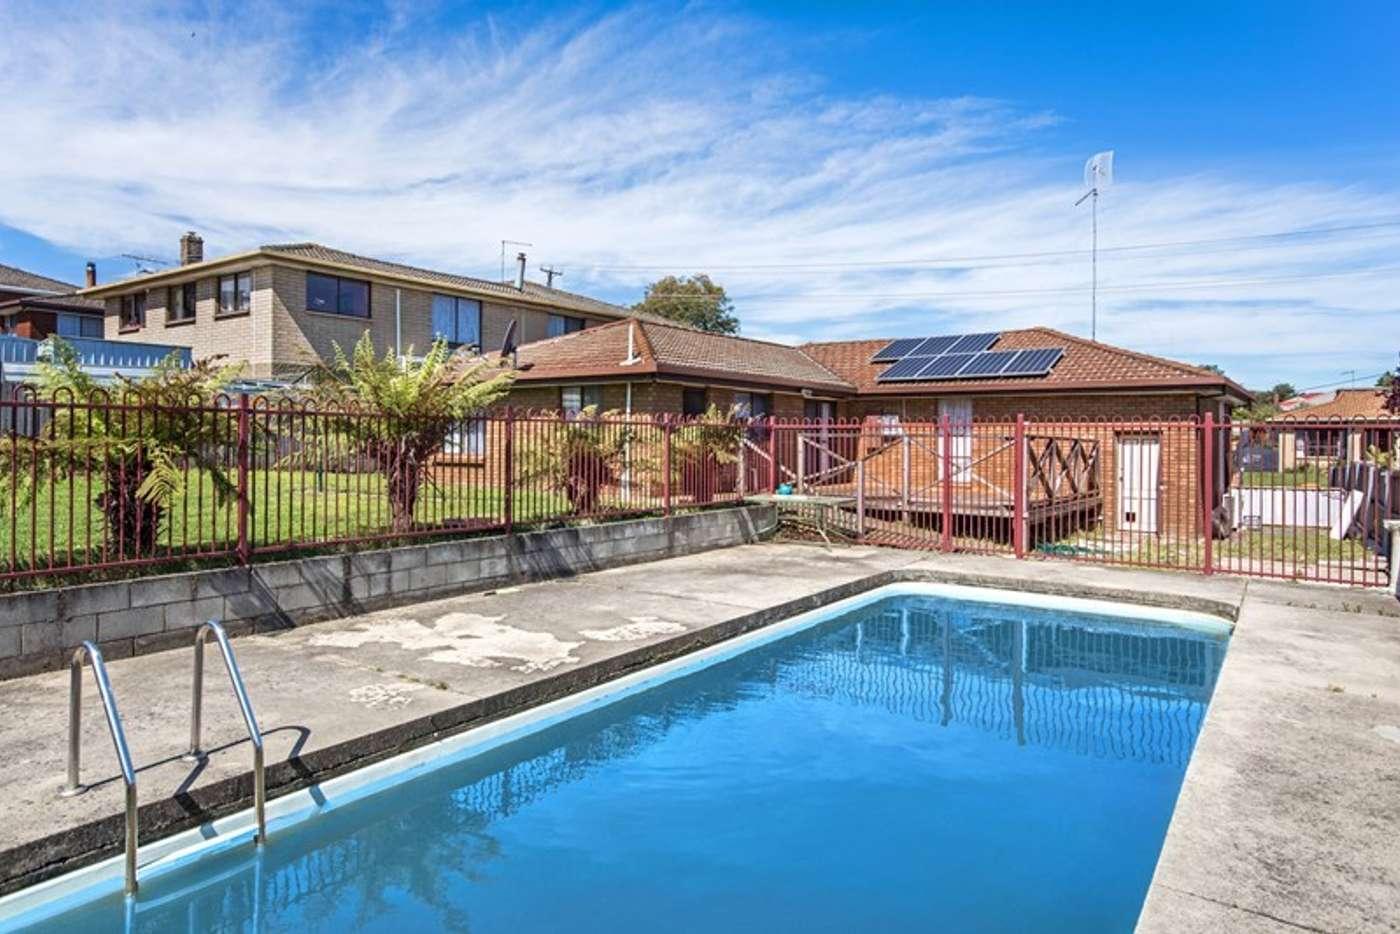 Main view of Homely house listing, 120 Viewbank Road, Newnham TAS 7248